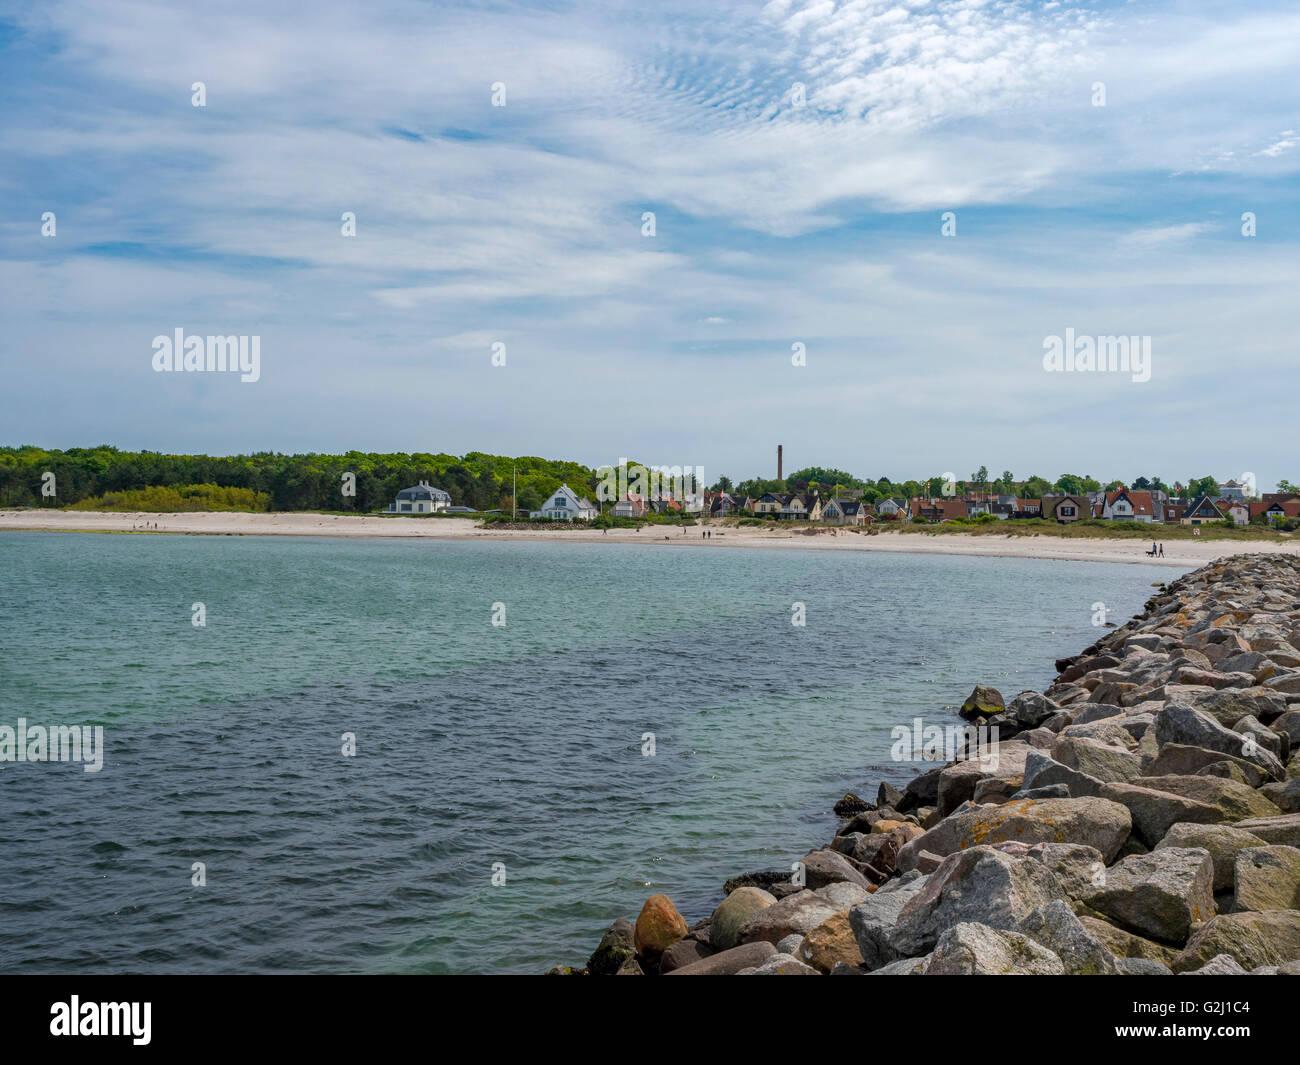 Hornbaek Beach, North Zealand, Denmark, Scandinavia, Europe - Stock Image